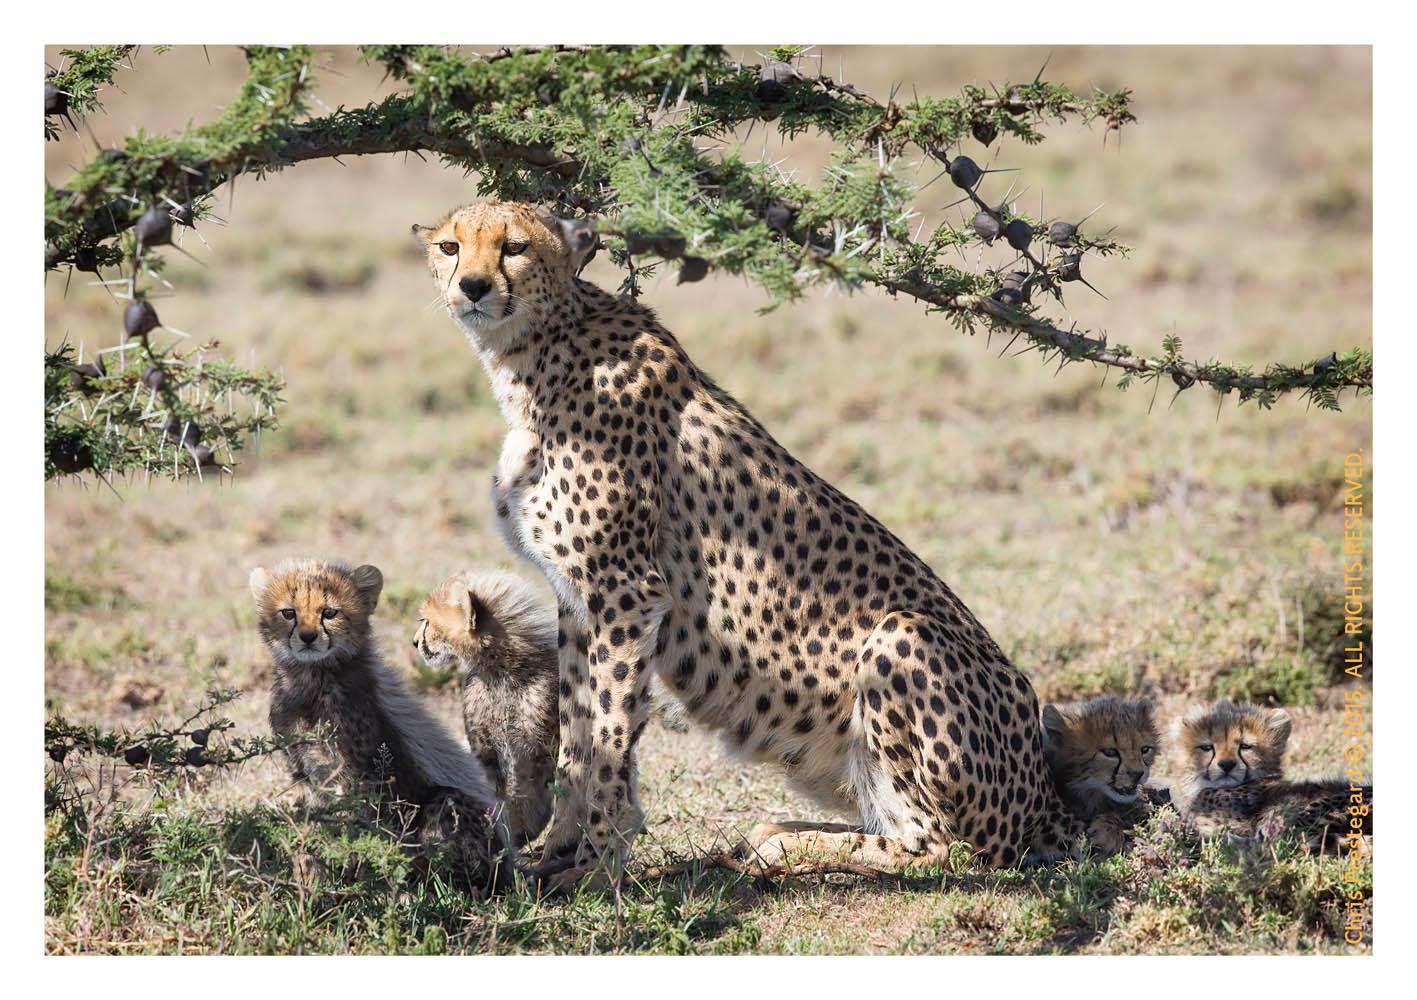 Cheetah 4539